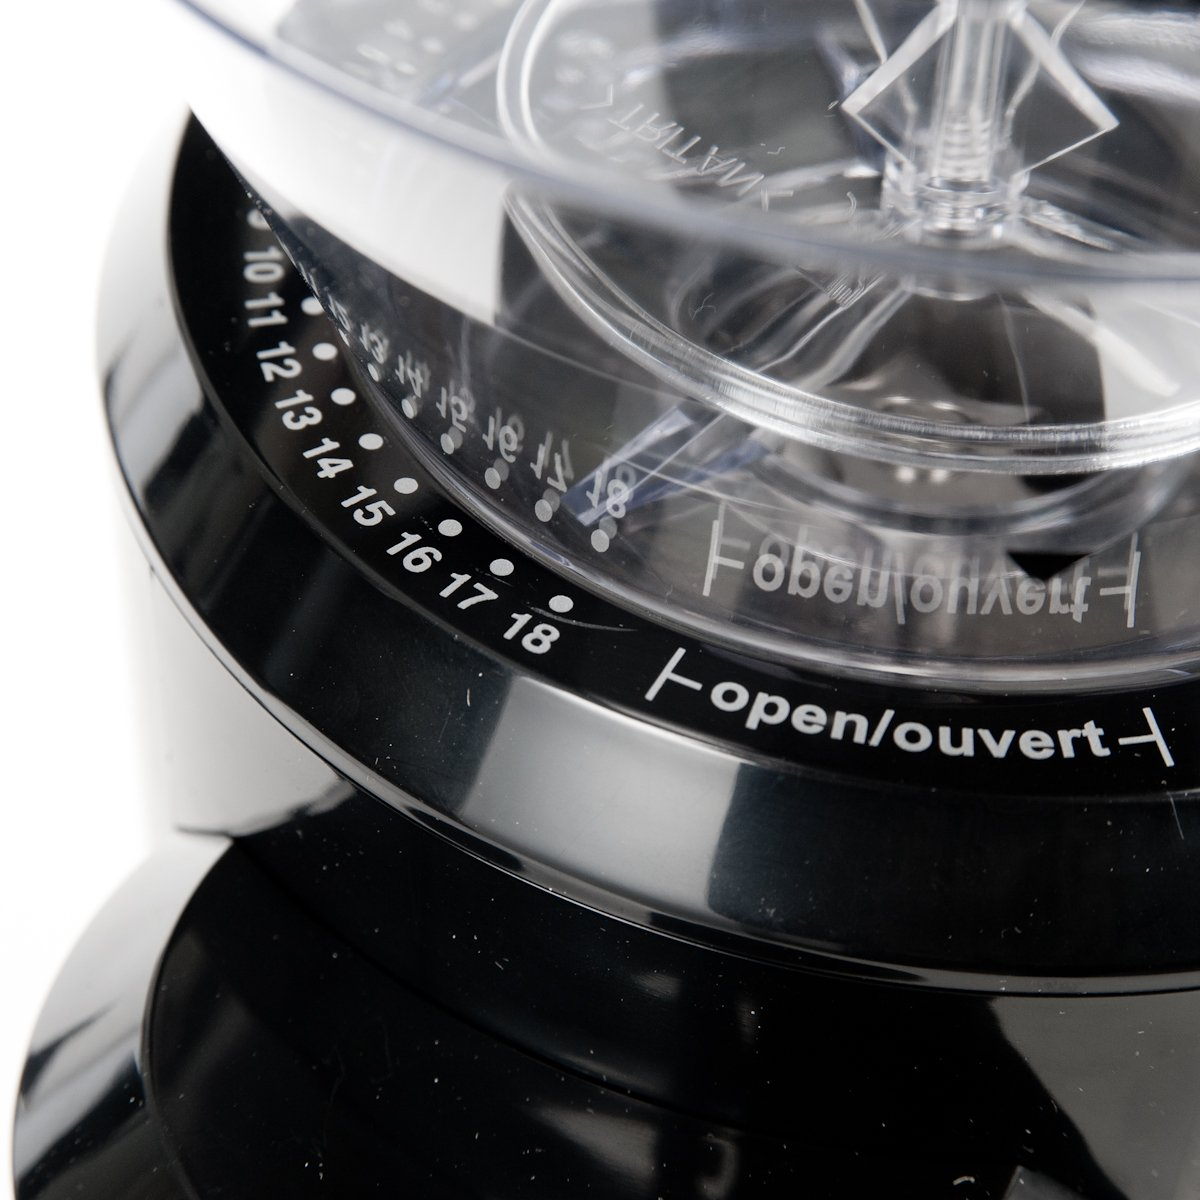 Secura Automatic Conical Burr Coffee Grinder CGB-018 Upper Grinder Cone